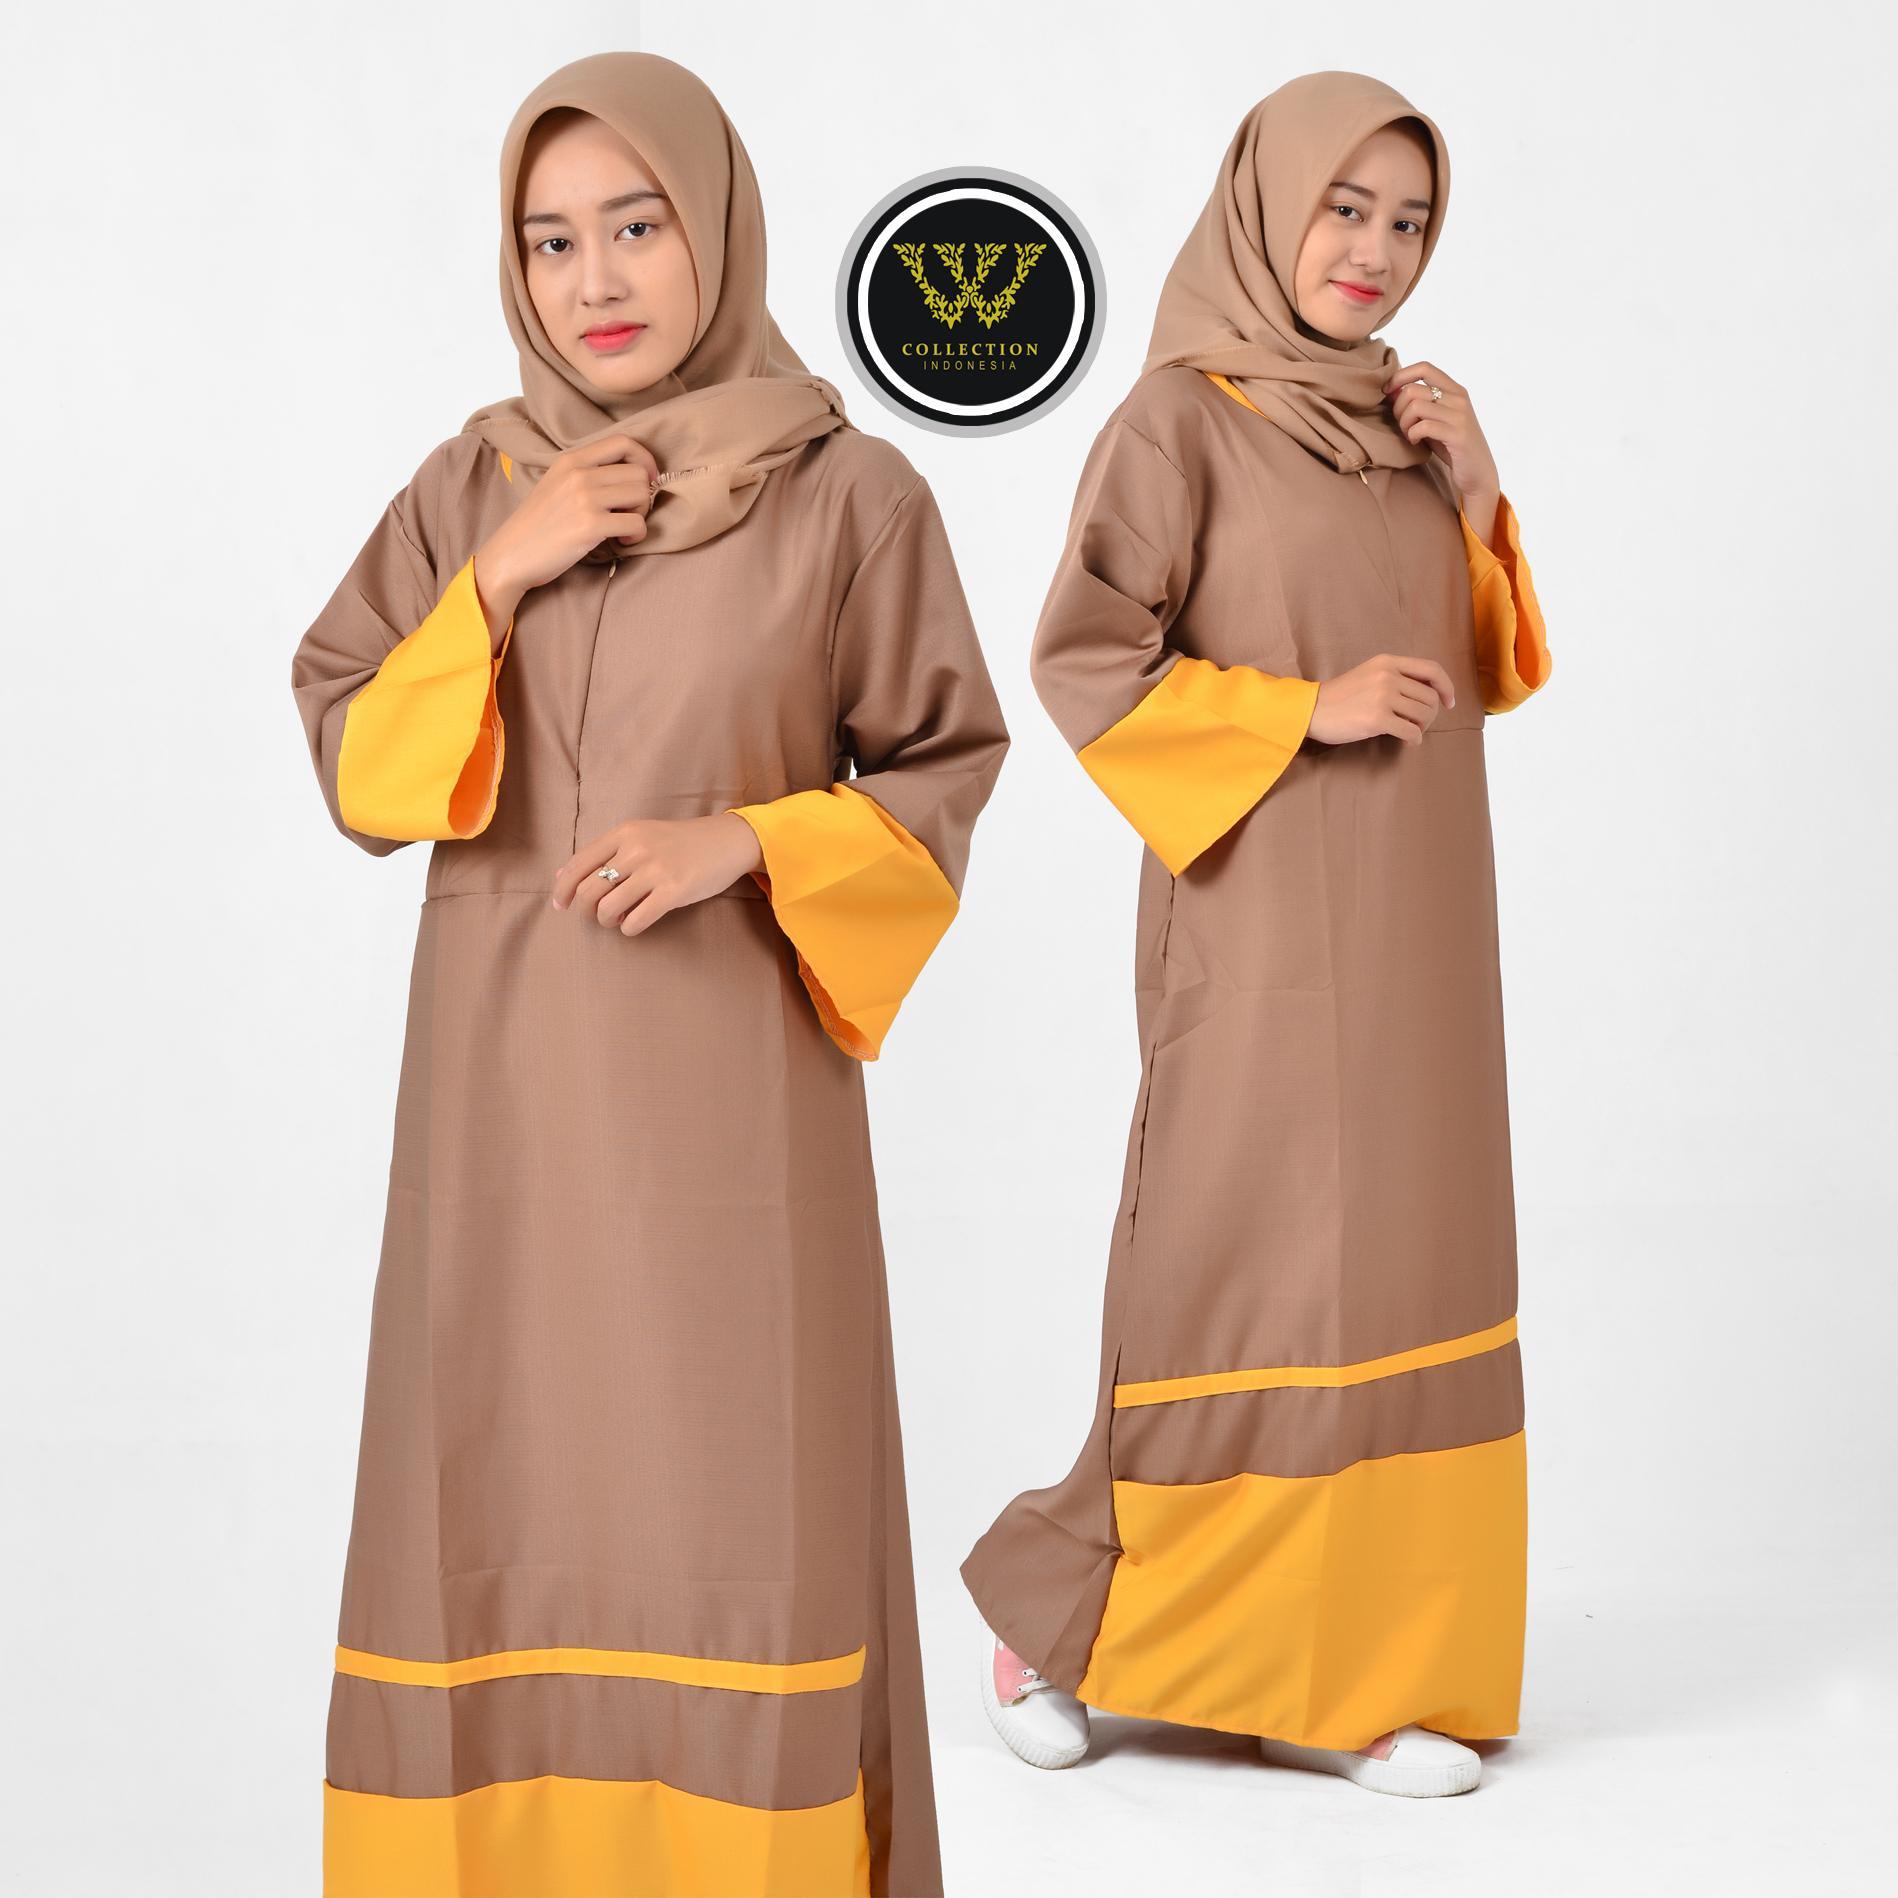 Cek Harga Baru Wuwus Gamis Balotelli Premium Polos Super Mayung Kerut Pinggang Kombinasi Warna Fashion Muslim Busui